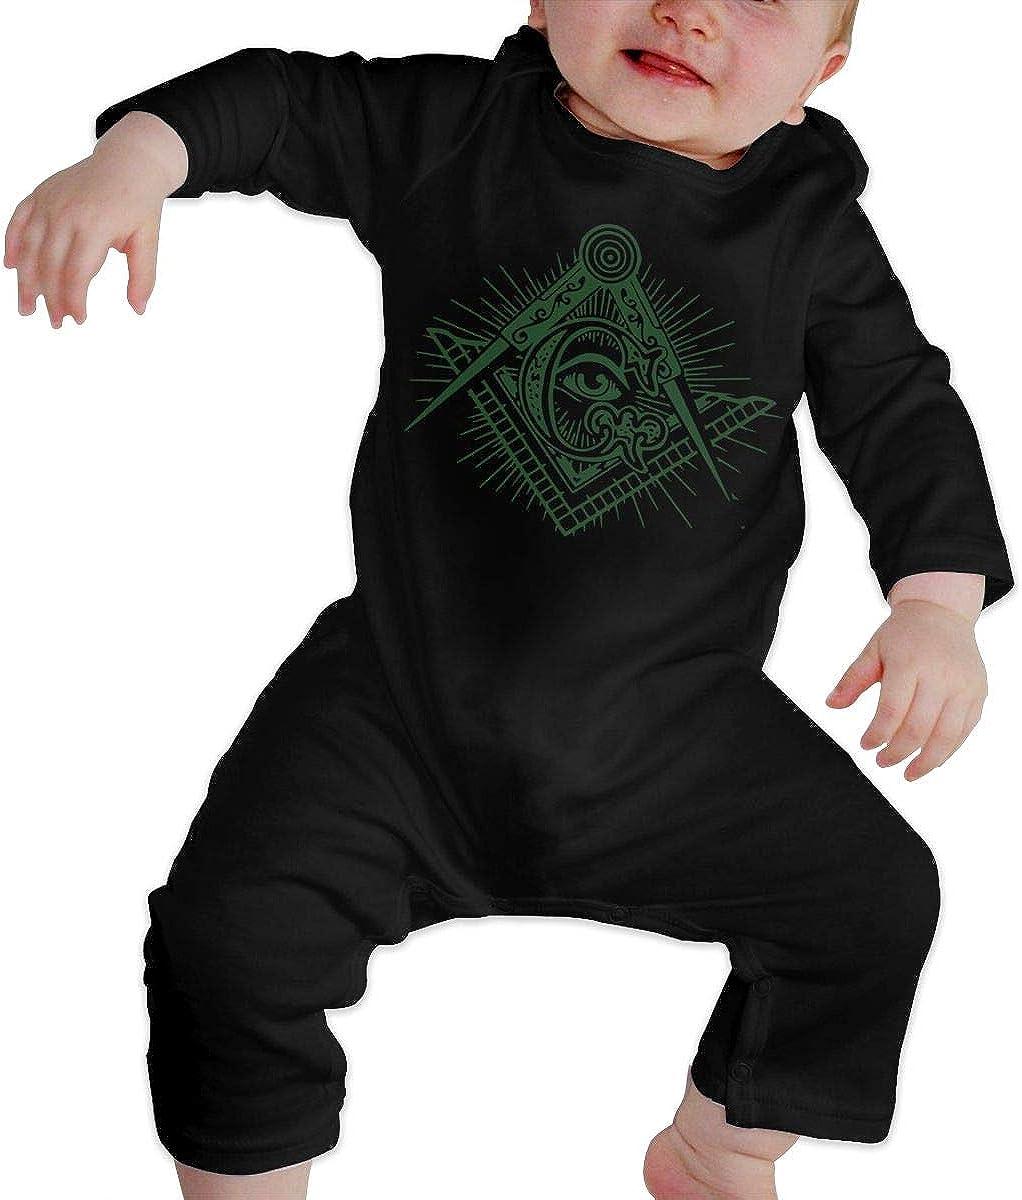 Moniery Freemason Eyes Long Sleeve Romper Bodysuits for Baby Girls Black